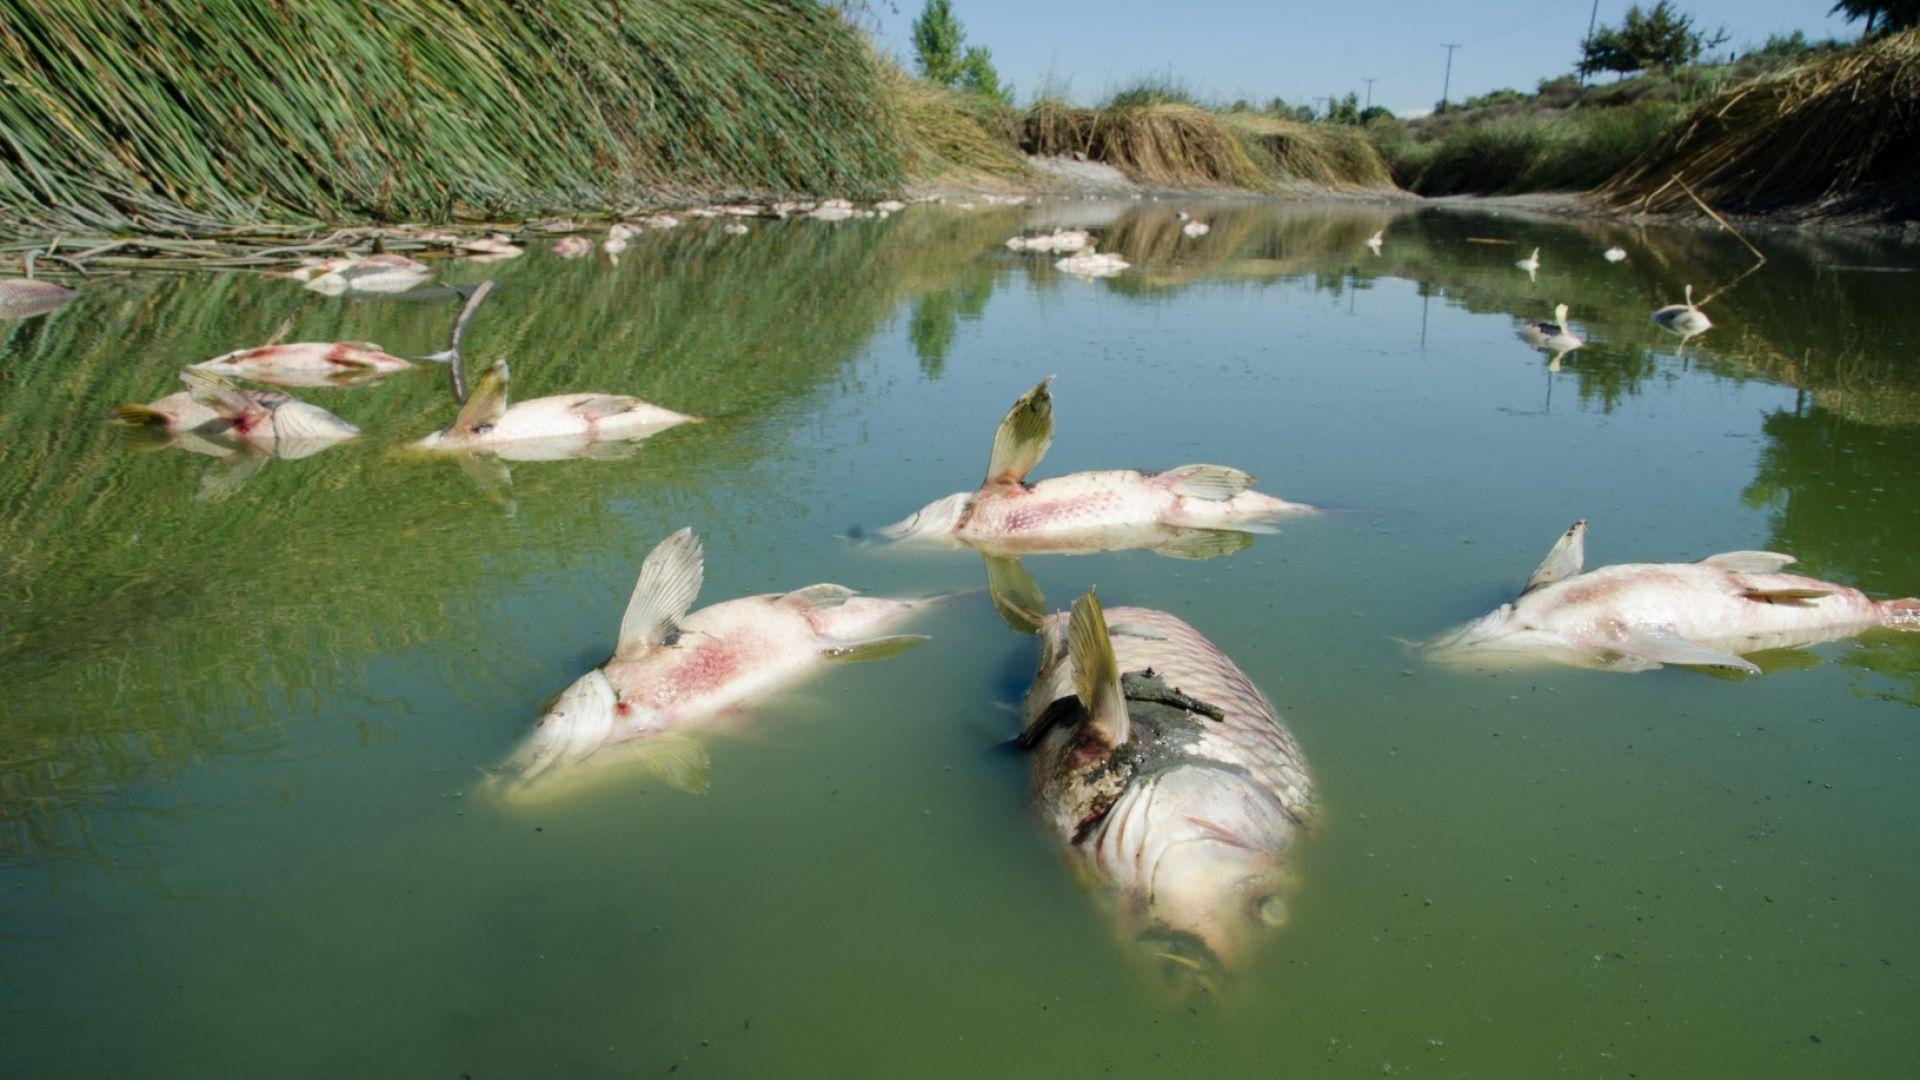 20 тона риба измря в германско езеро заради недостиг на кислород